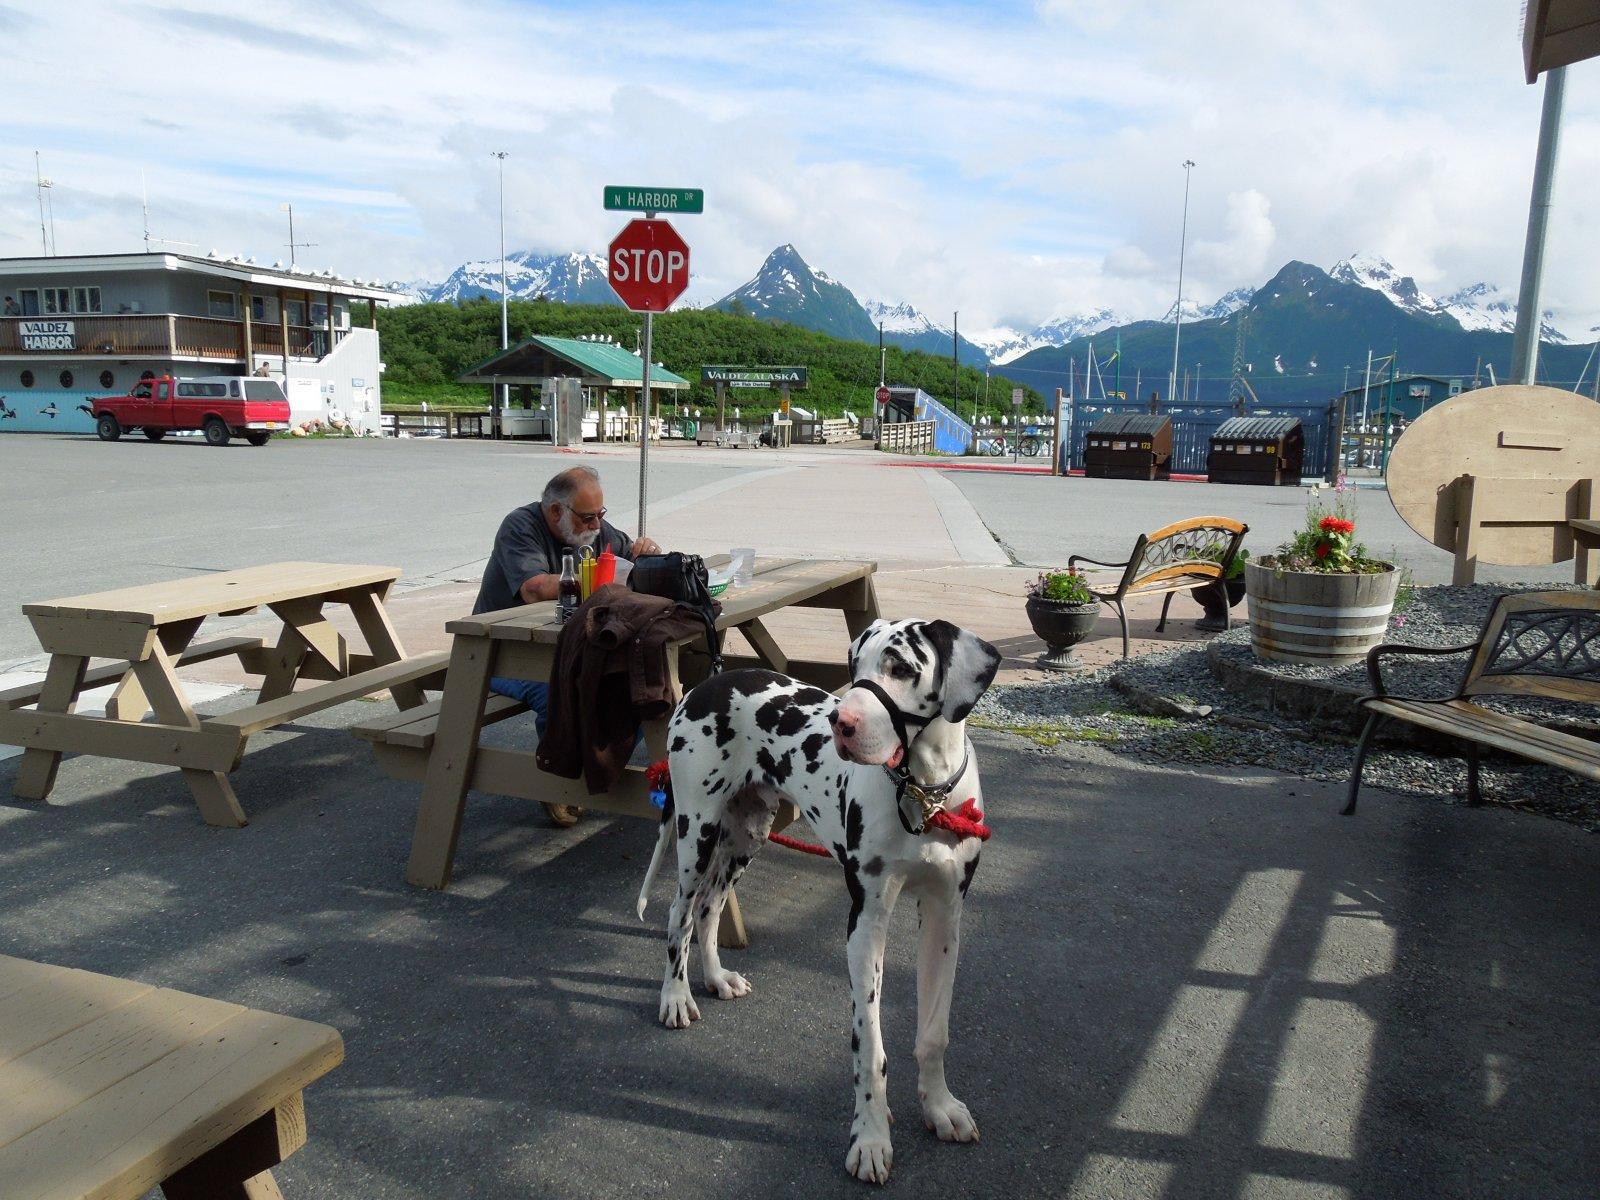 Click image for larger version  Name:Valdez to Copper River Center 081.jpg Views:62 Size:362.5 KB ID:215360